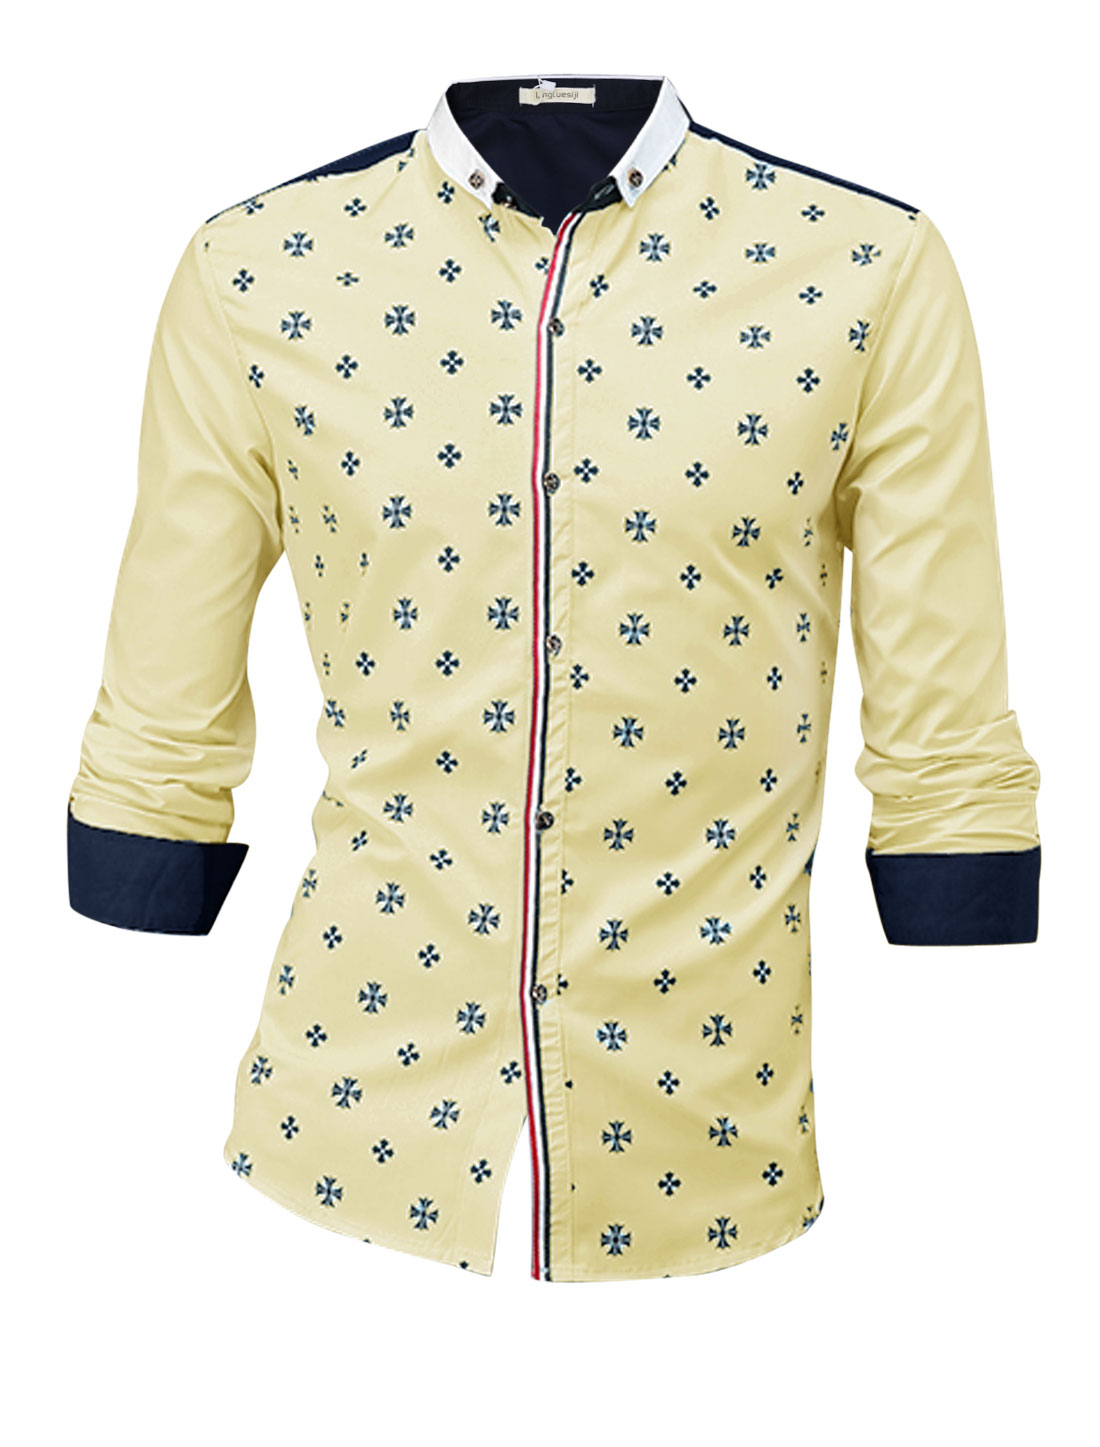 Man Light Yellow Cross Pattern Contrast Cuffs Slim Fit Button Down Shirt S